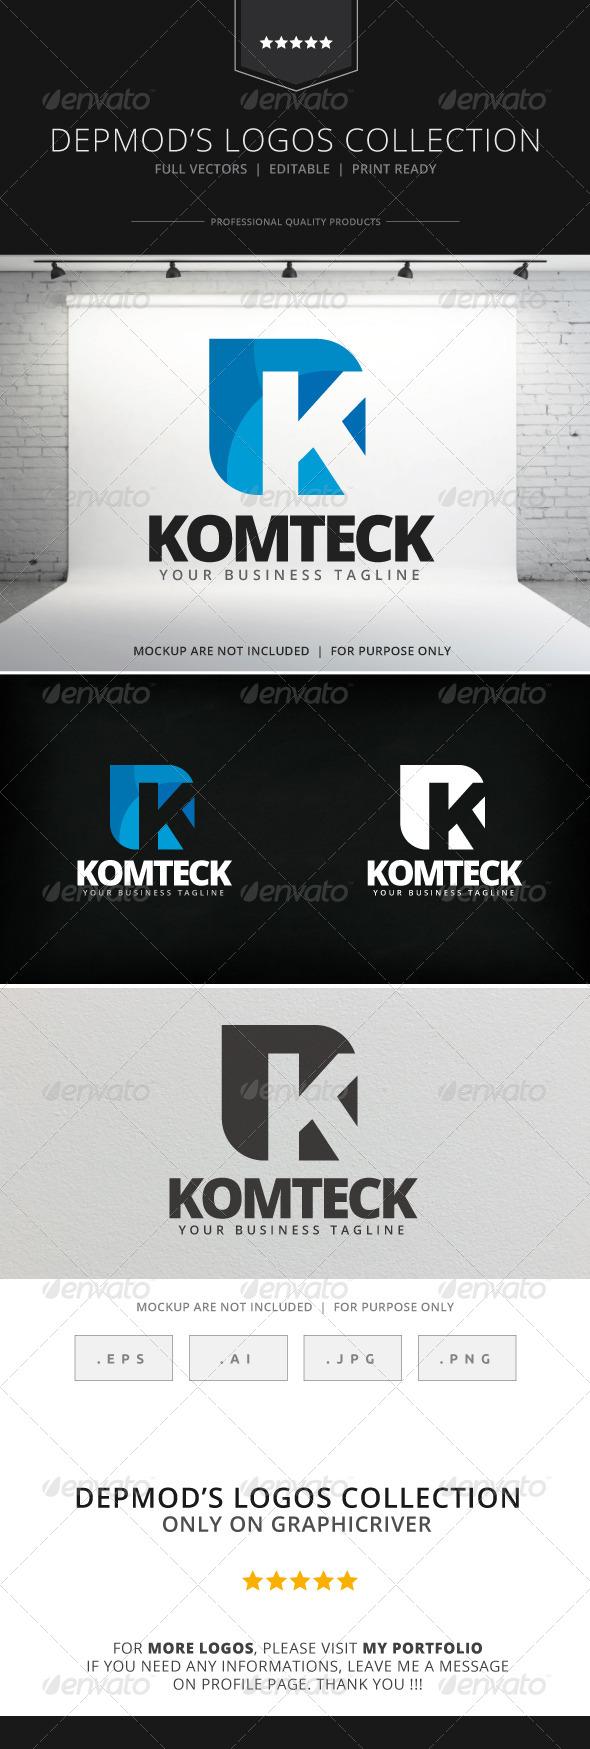 GraphicRiver Komteck Logo 7909338